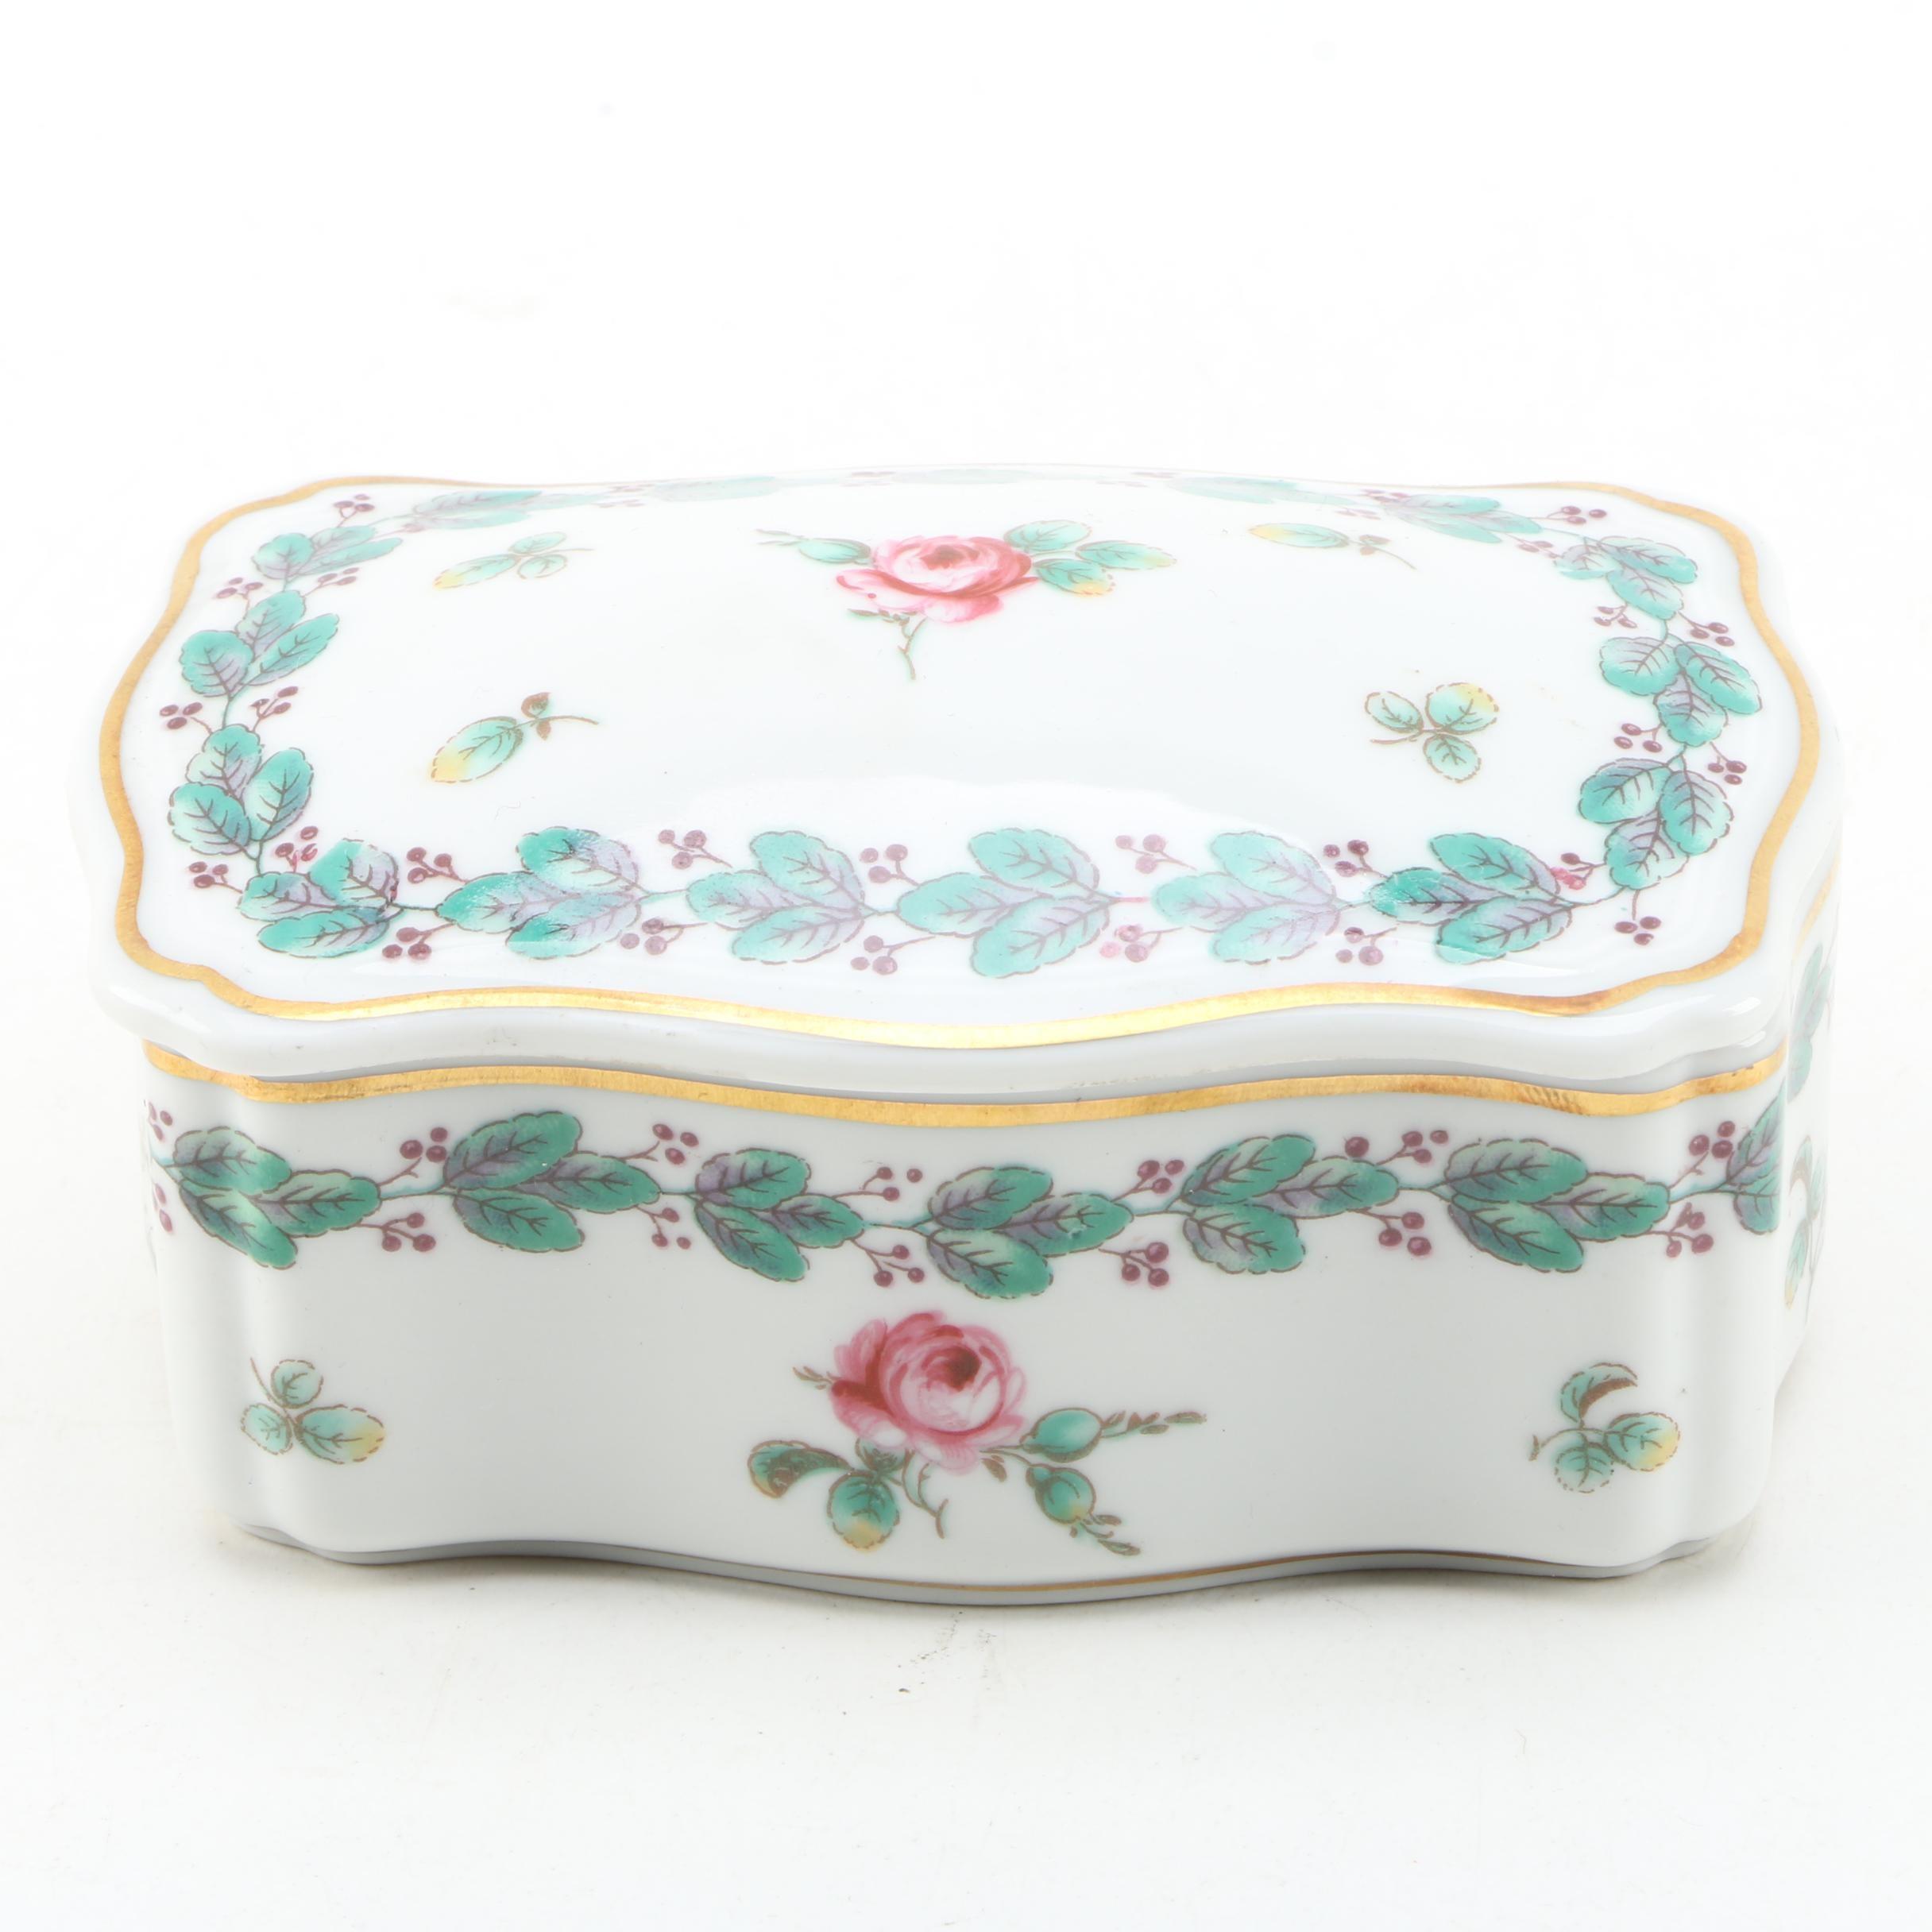 Richard Ginori Italian Porcelain Trinket Box